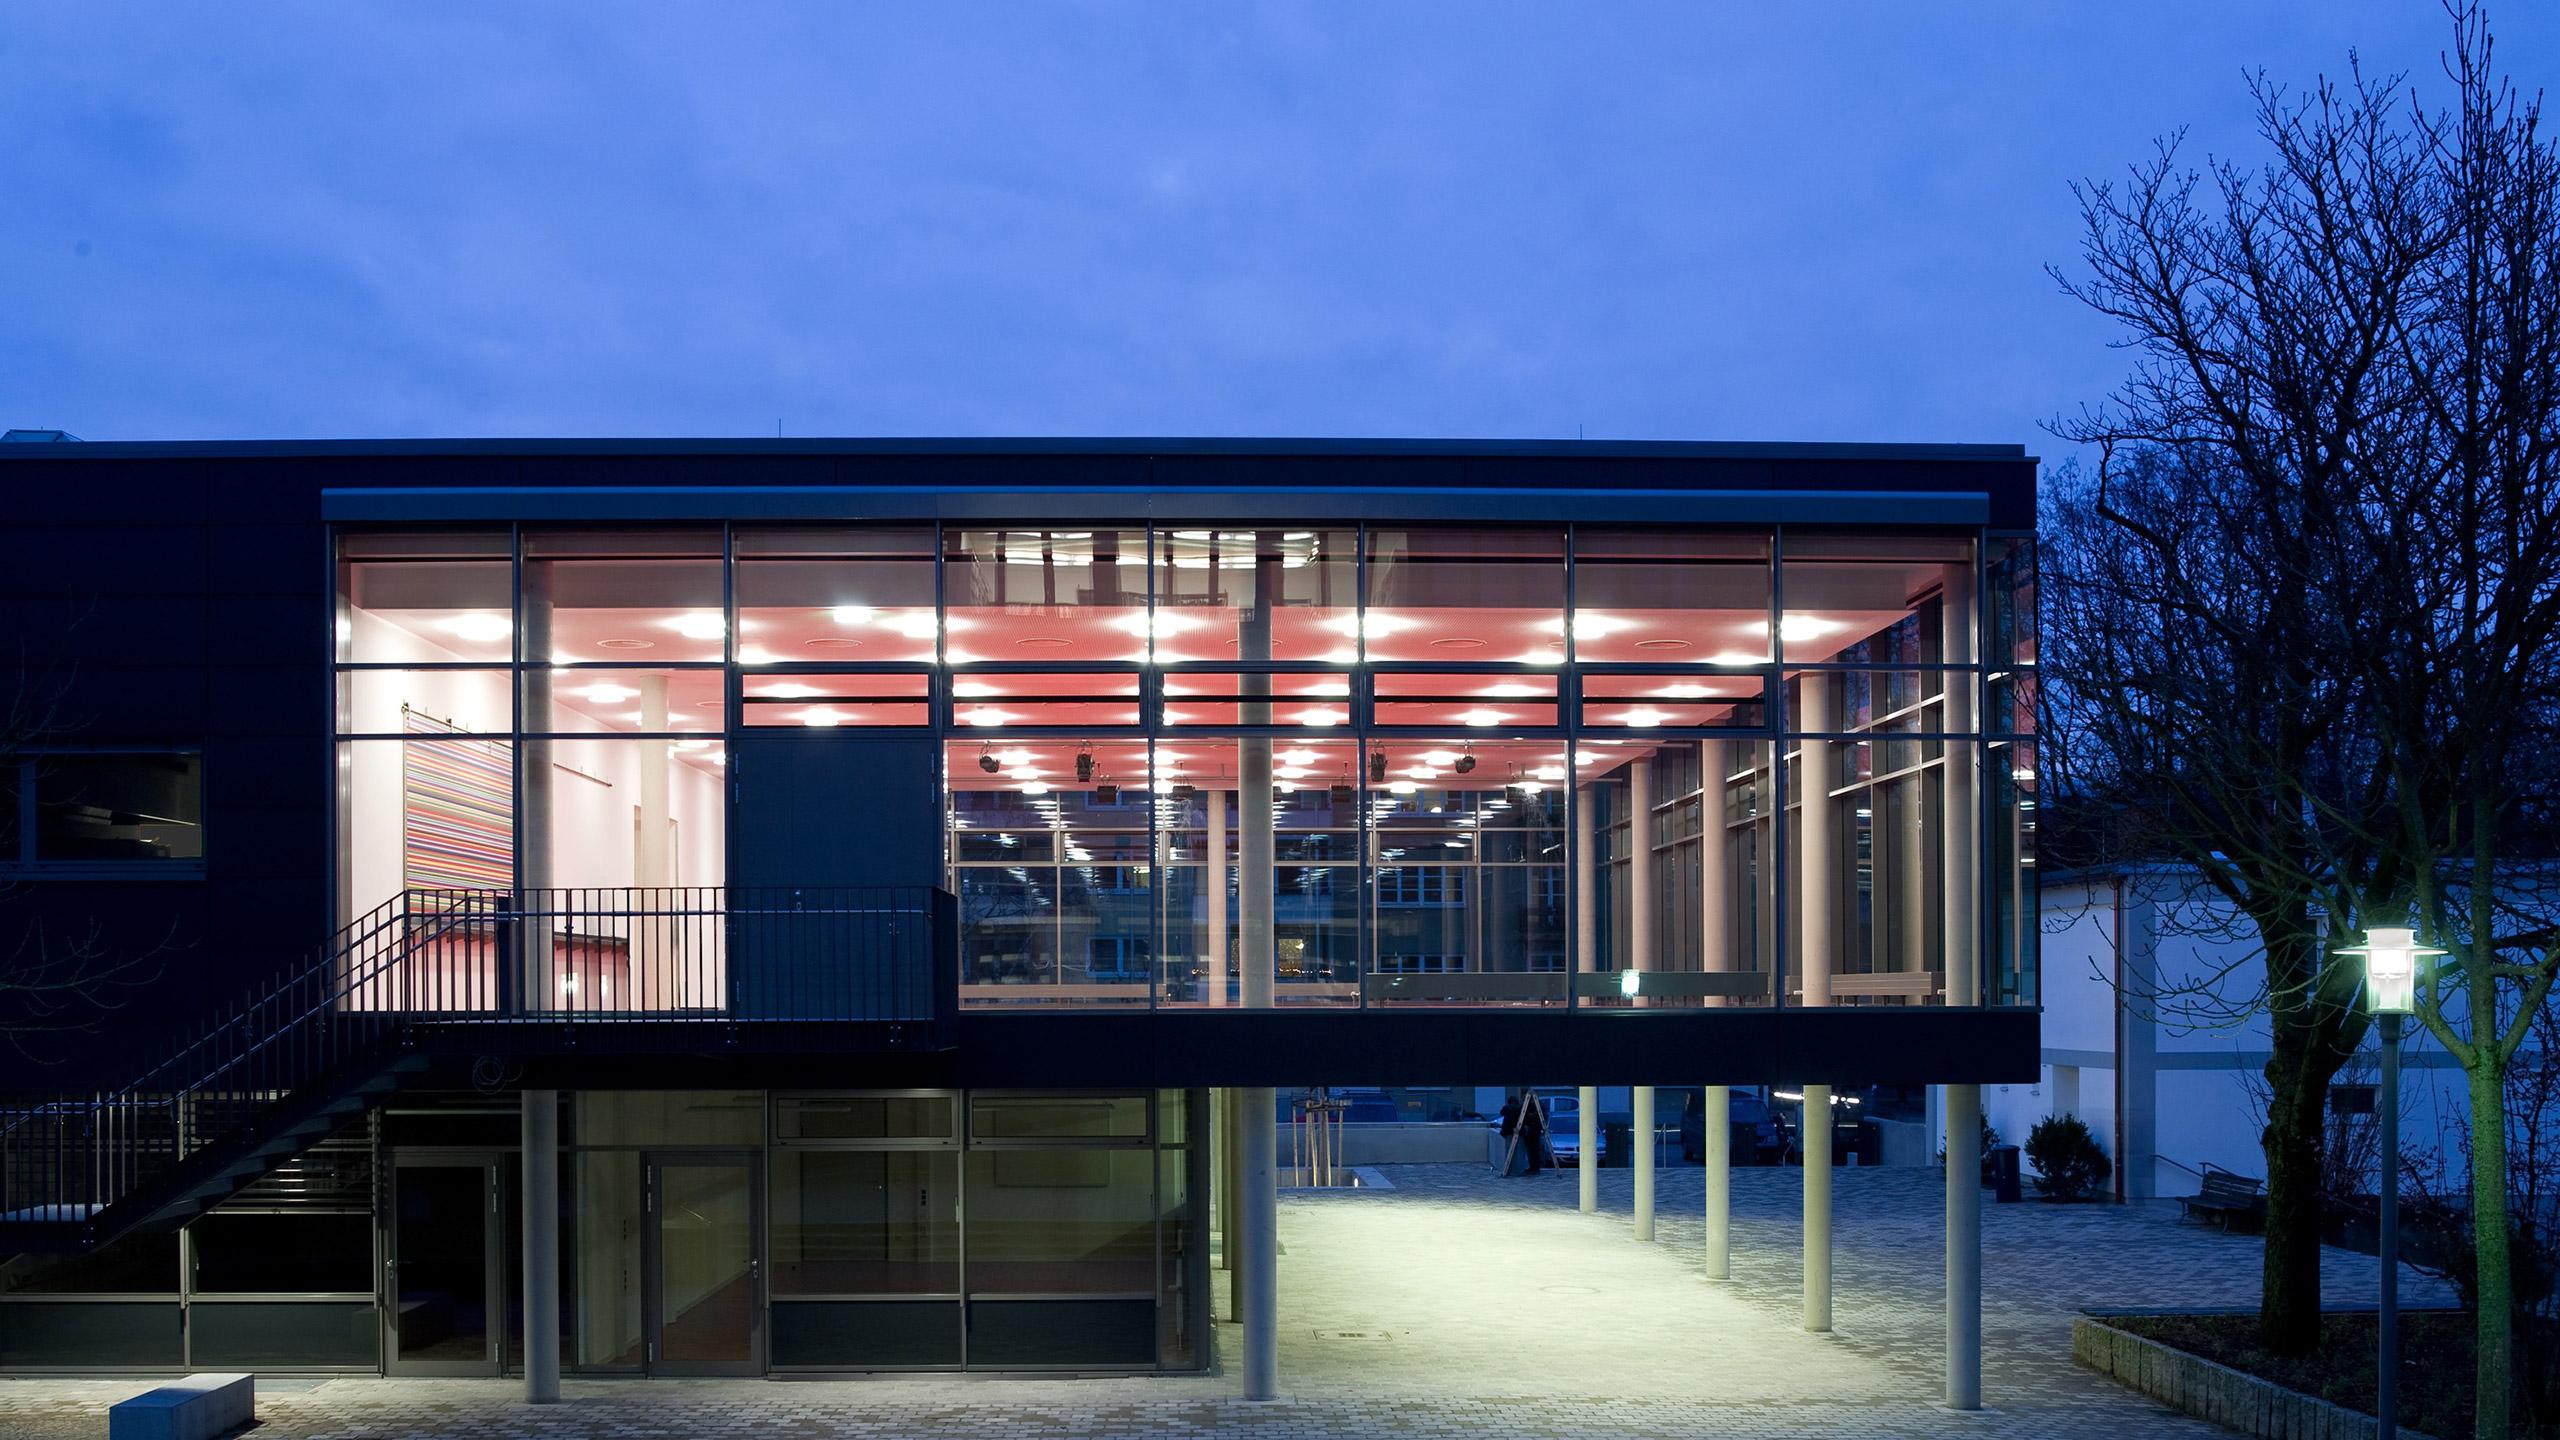 Mensa Architektur